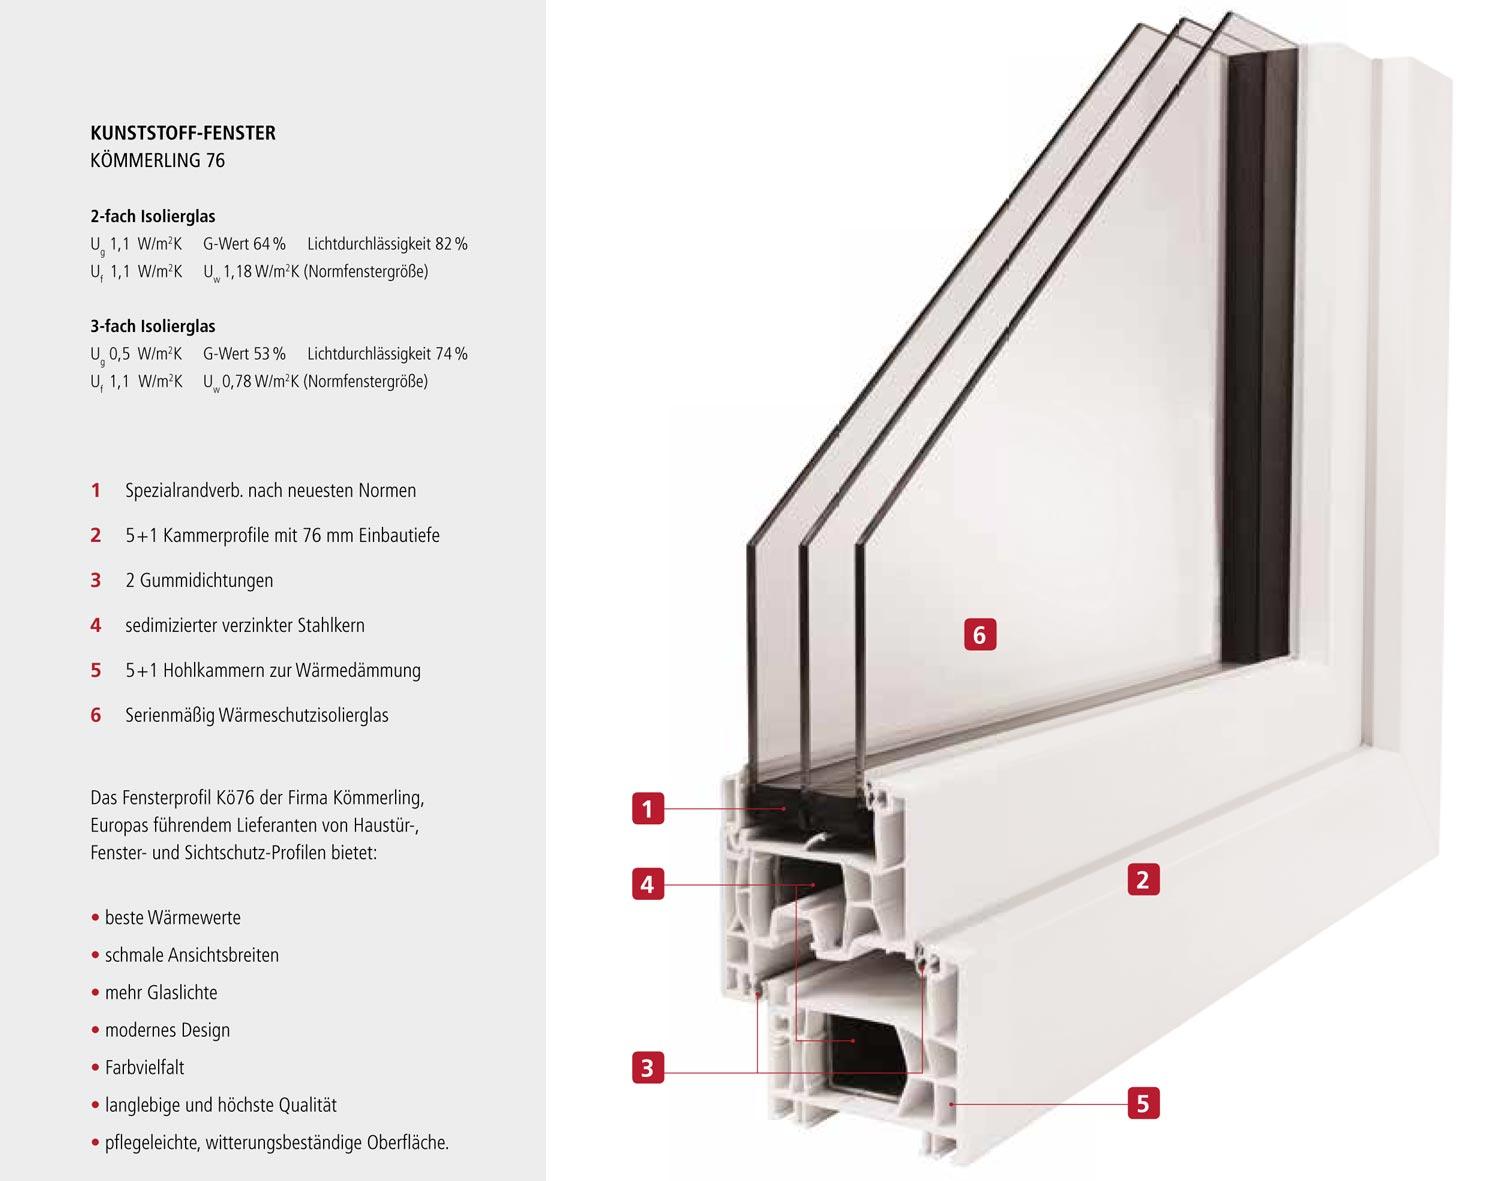 Kunststoff fenster lauber fensterbau for Fensterdetail